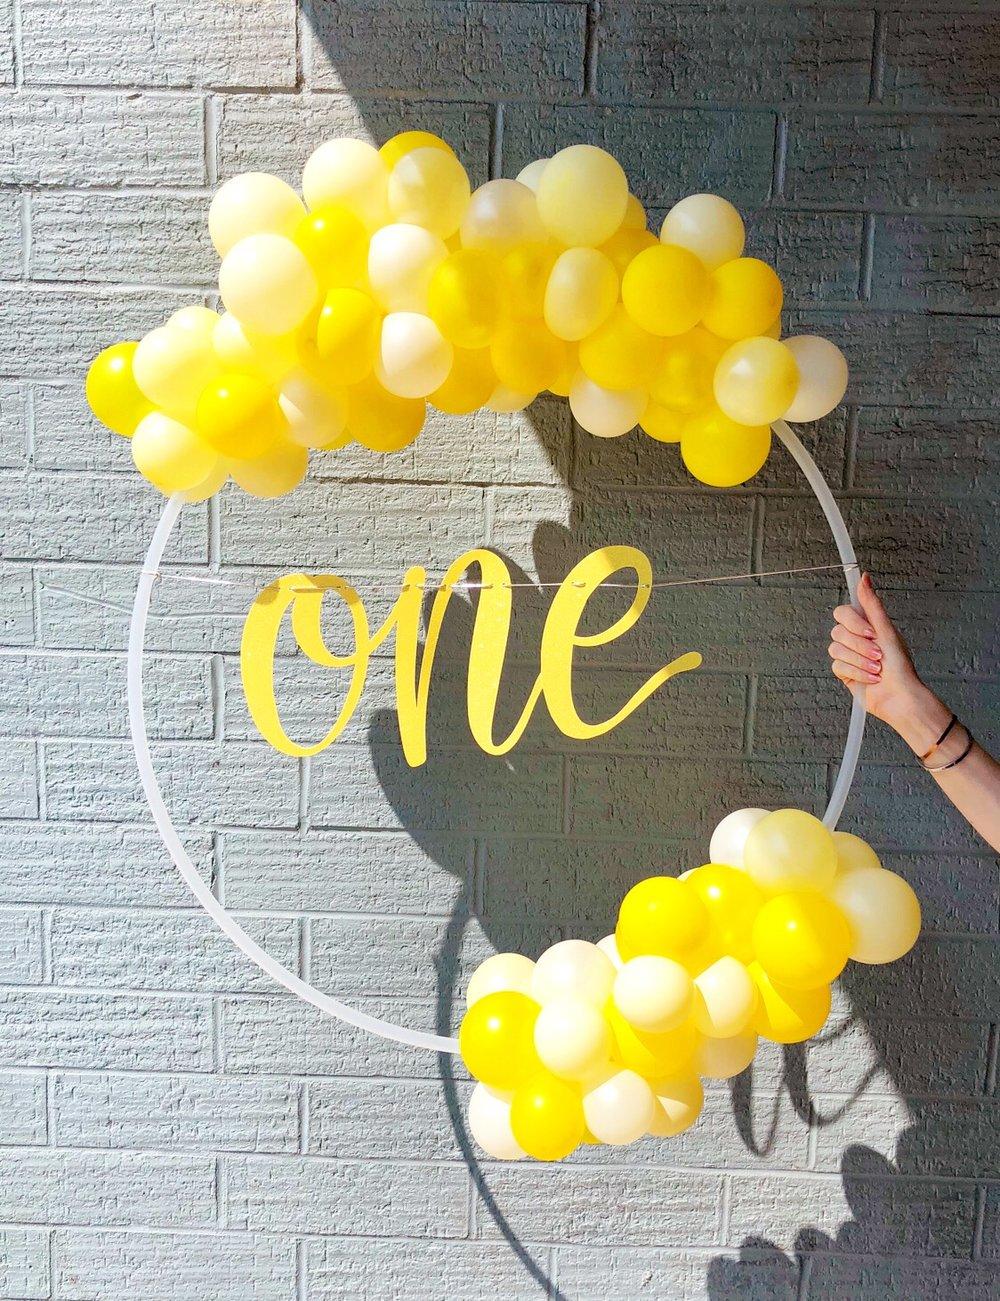 vroom_vroom_balloon_wreath_lemon_one.JPG